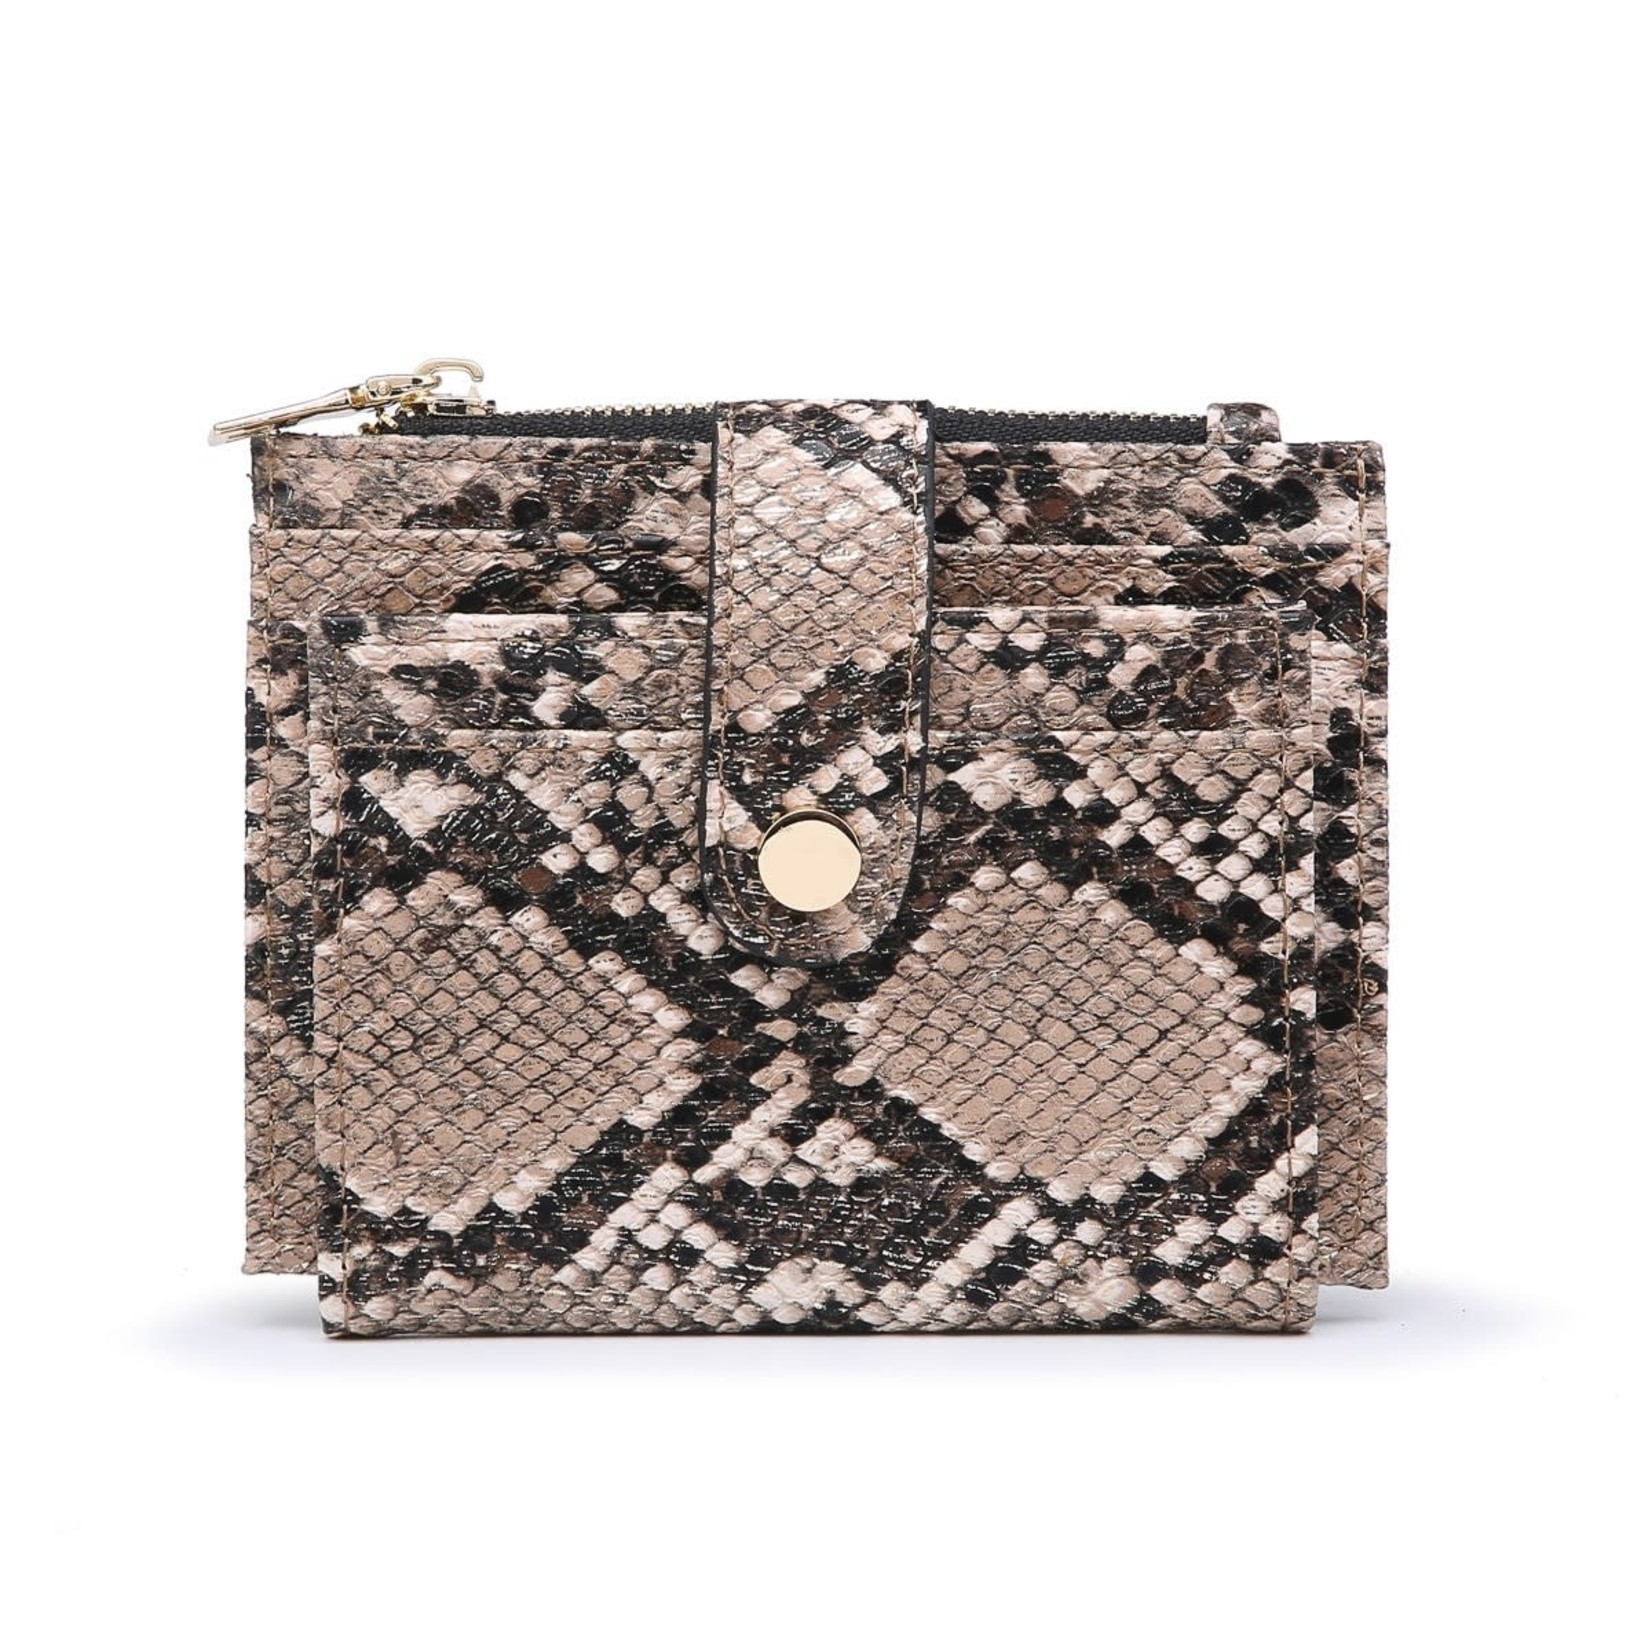 Bronze Python Wallet/Credit Card Holder in Vegan Leather